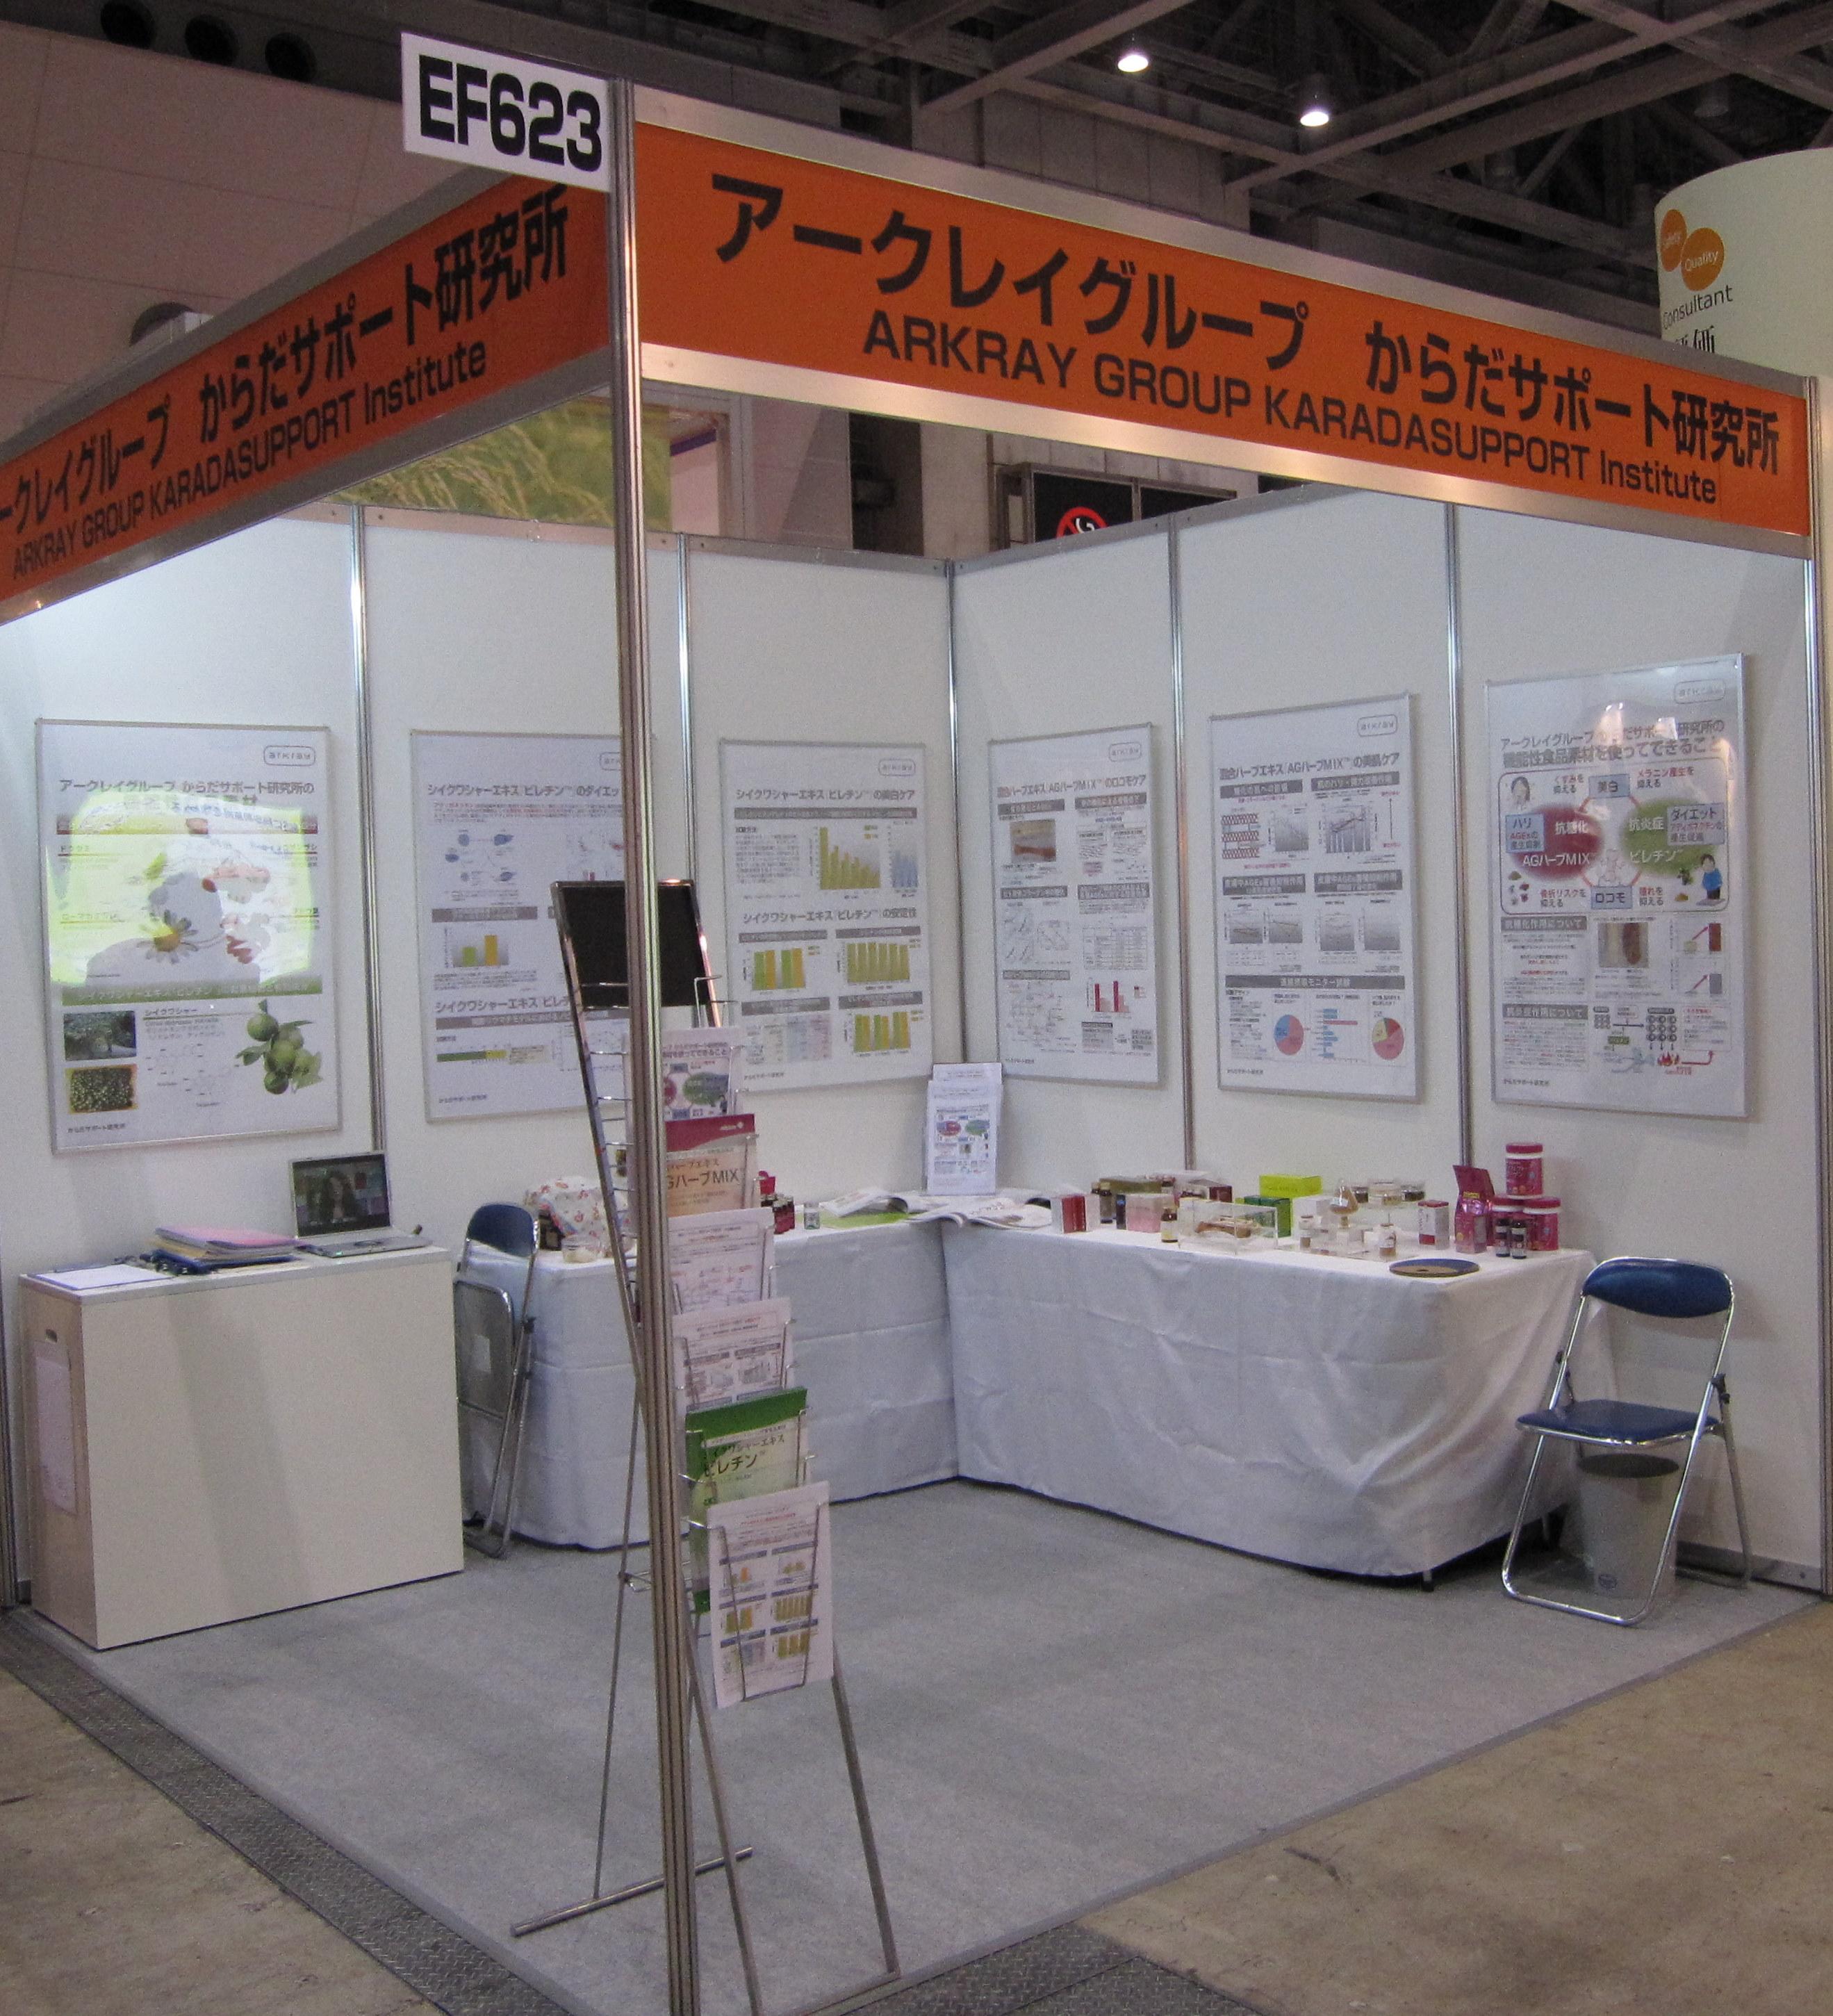 ifia/HFE JAPAN2011 アークレイ